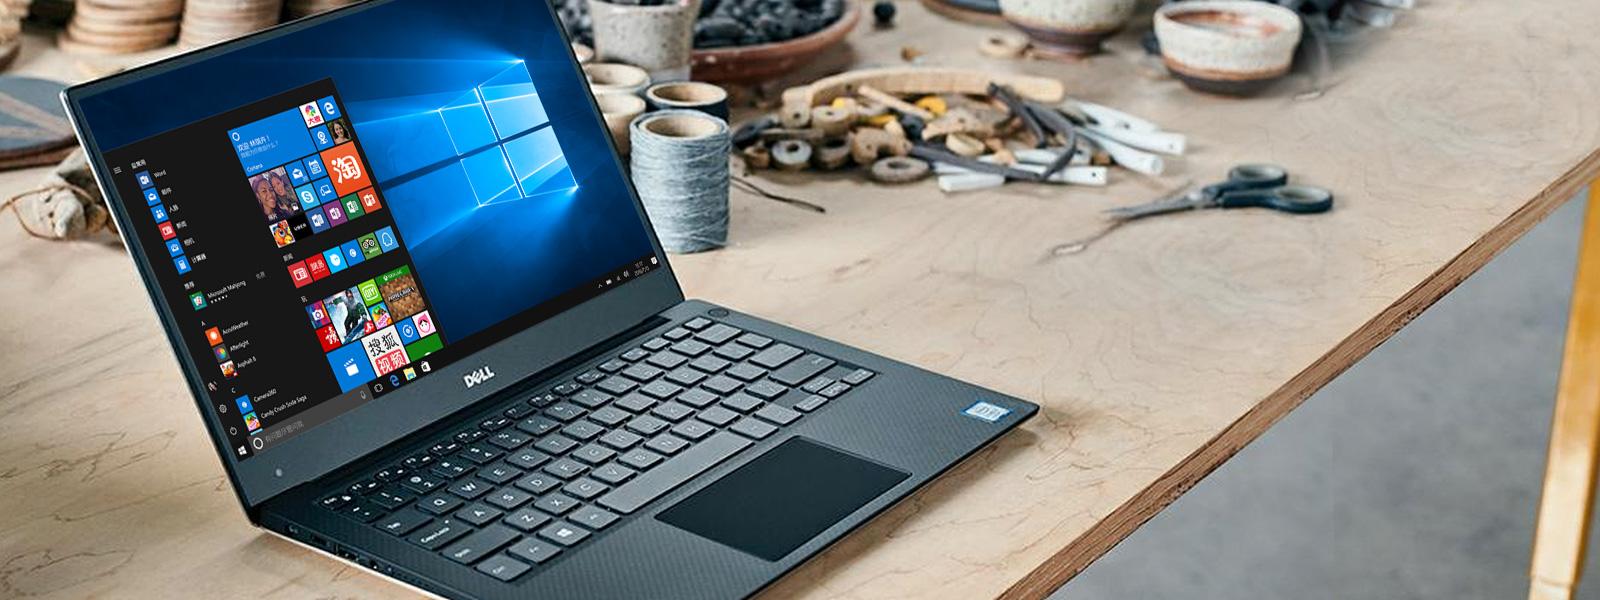 Dell XPS 13 顯示 Windows 10 [開始] 畫面